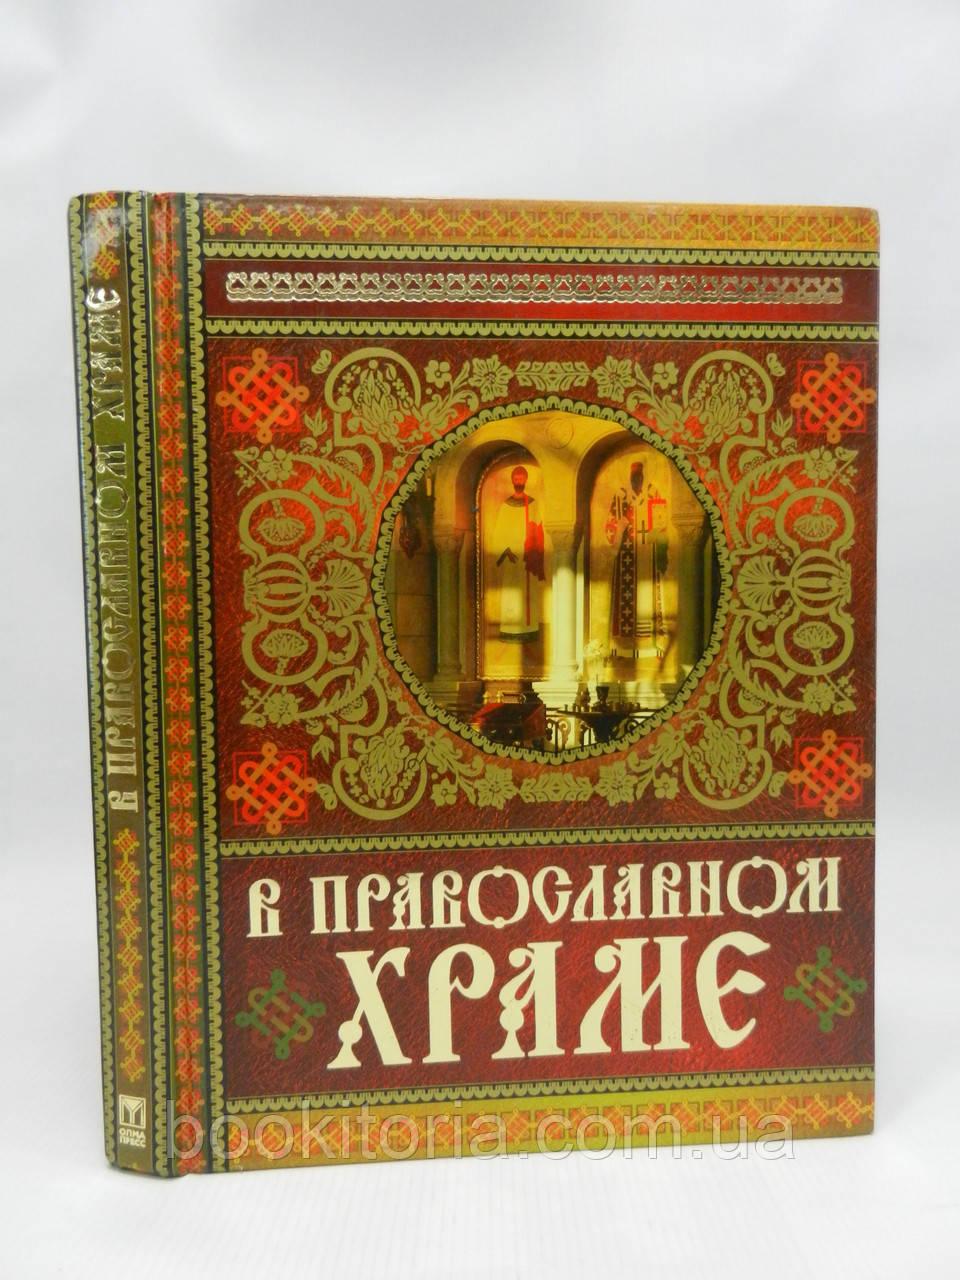 Щеголева Е., Глаголева О. В православном храме (б/у).